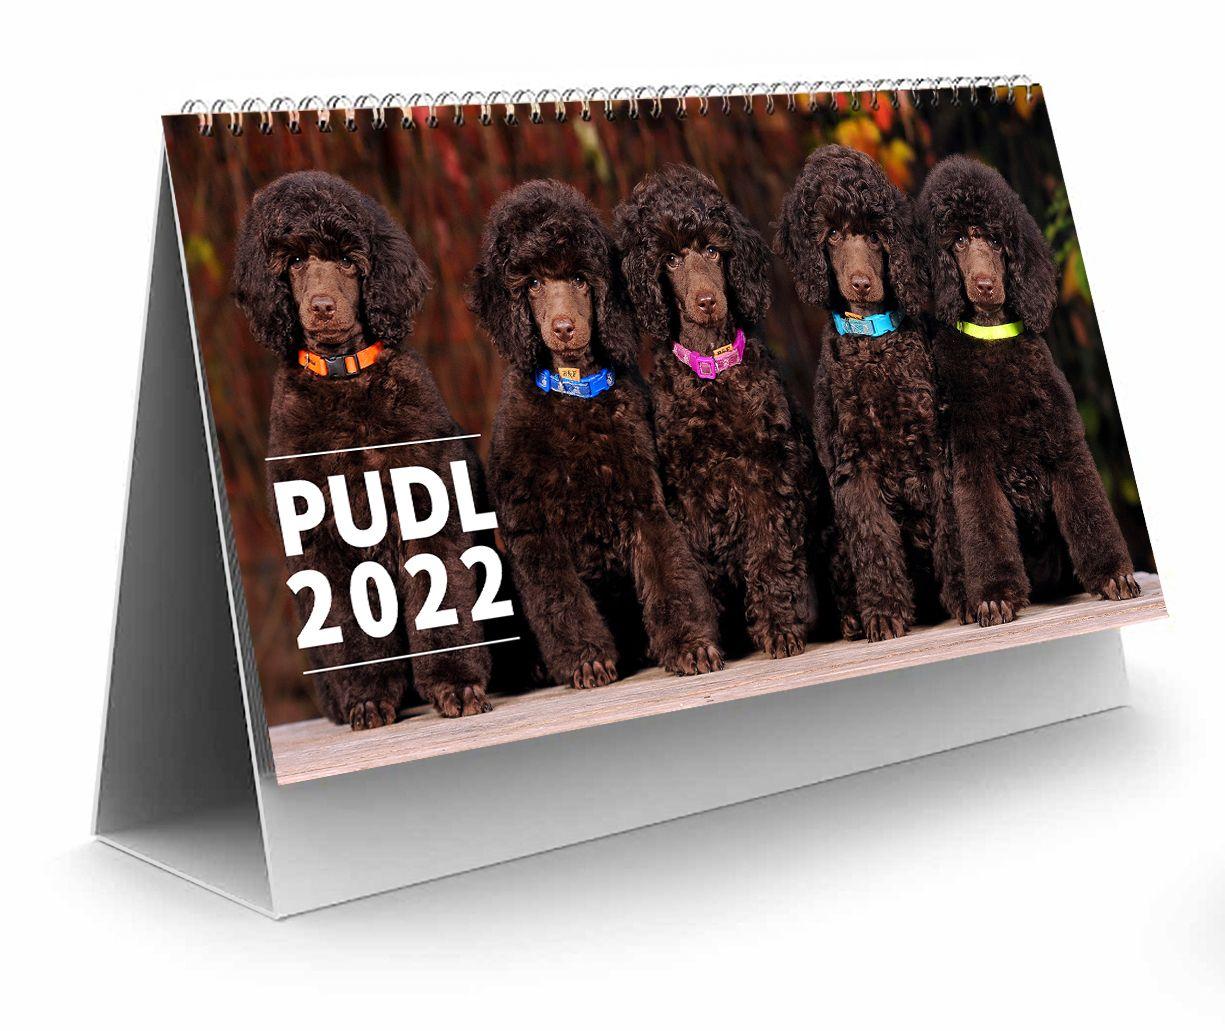 Kalendář pudl 2022